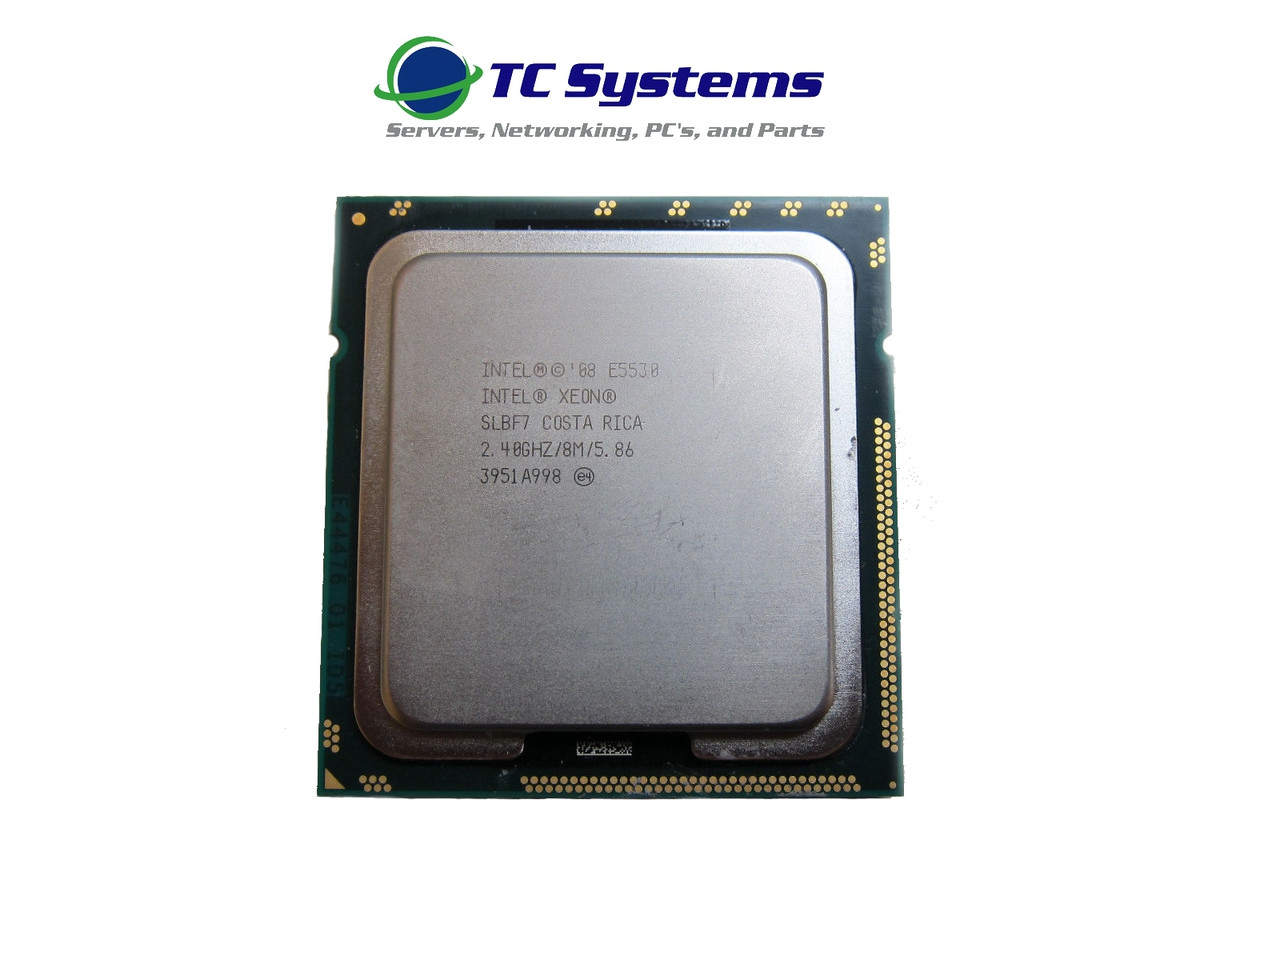 Intel SLBF7